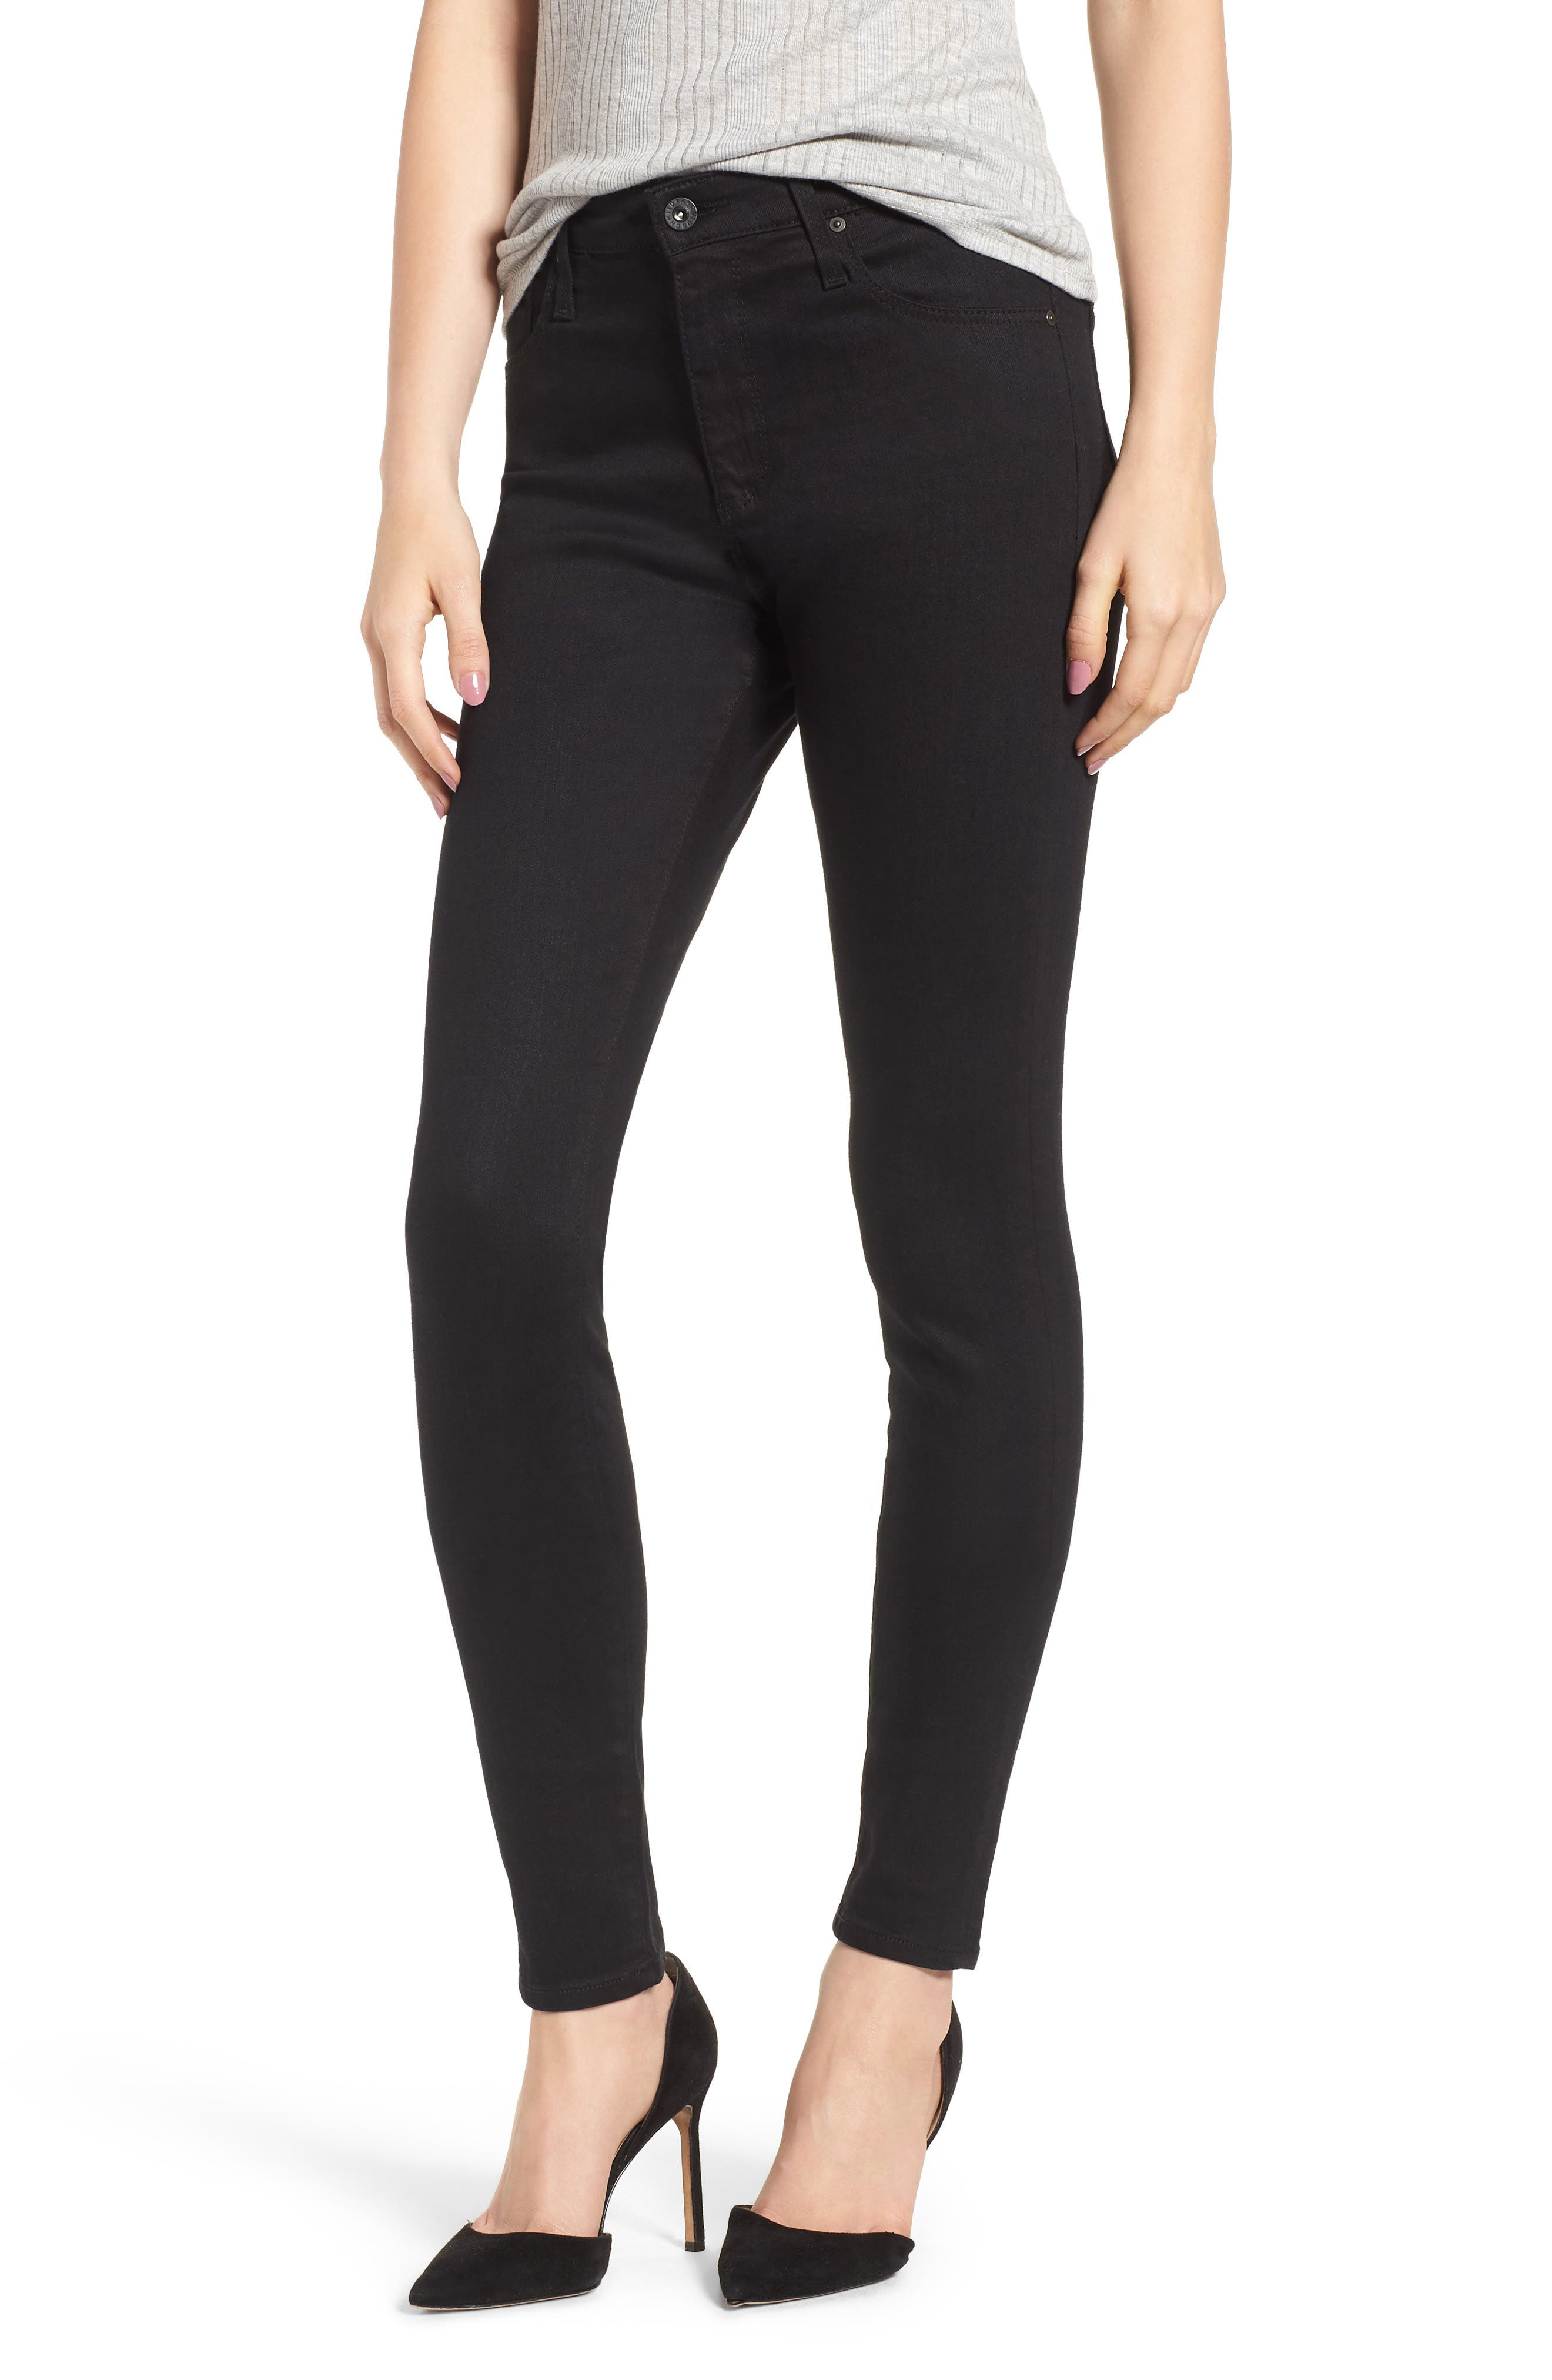 AG 'The Farrah' High Rise Skinny Jeans, Main, color, 010